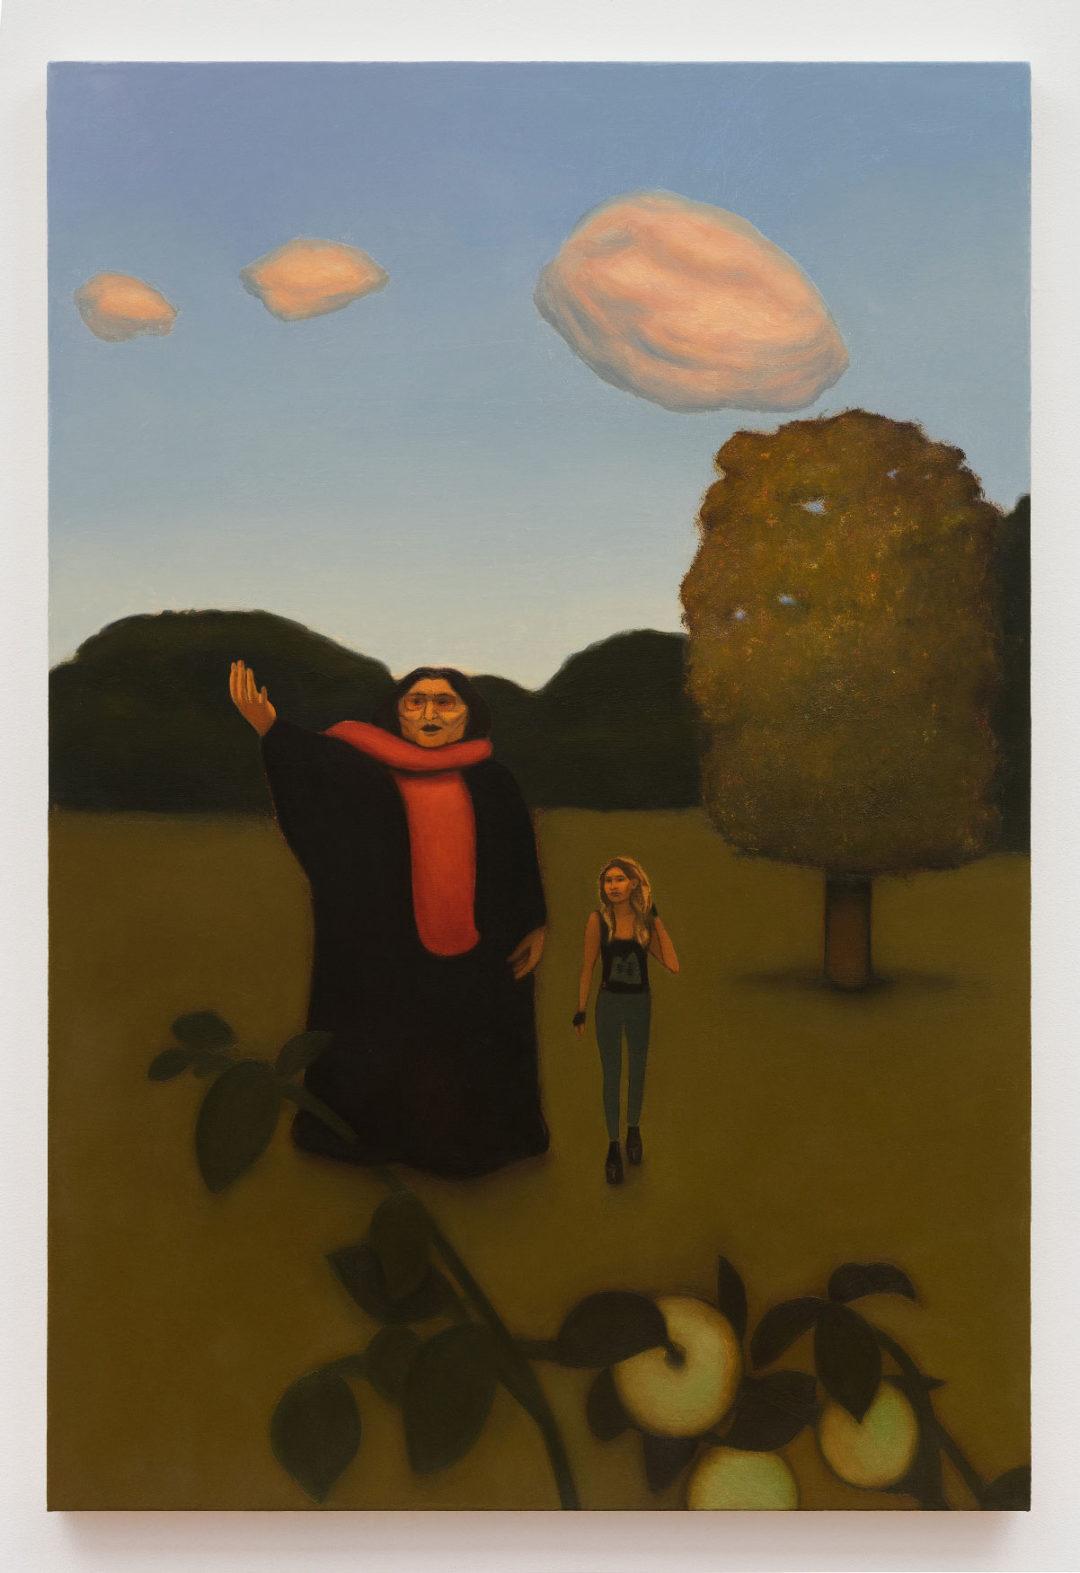 Anna Glantz  The Music Lesson (Mercedes Sosa)  2019  Oil on canvas  50 x 34 inches  127 x 86.4 cm